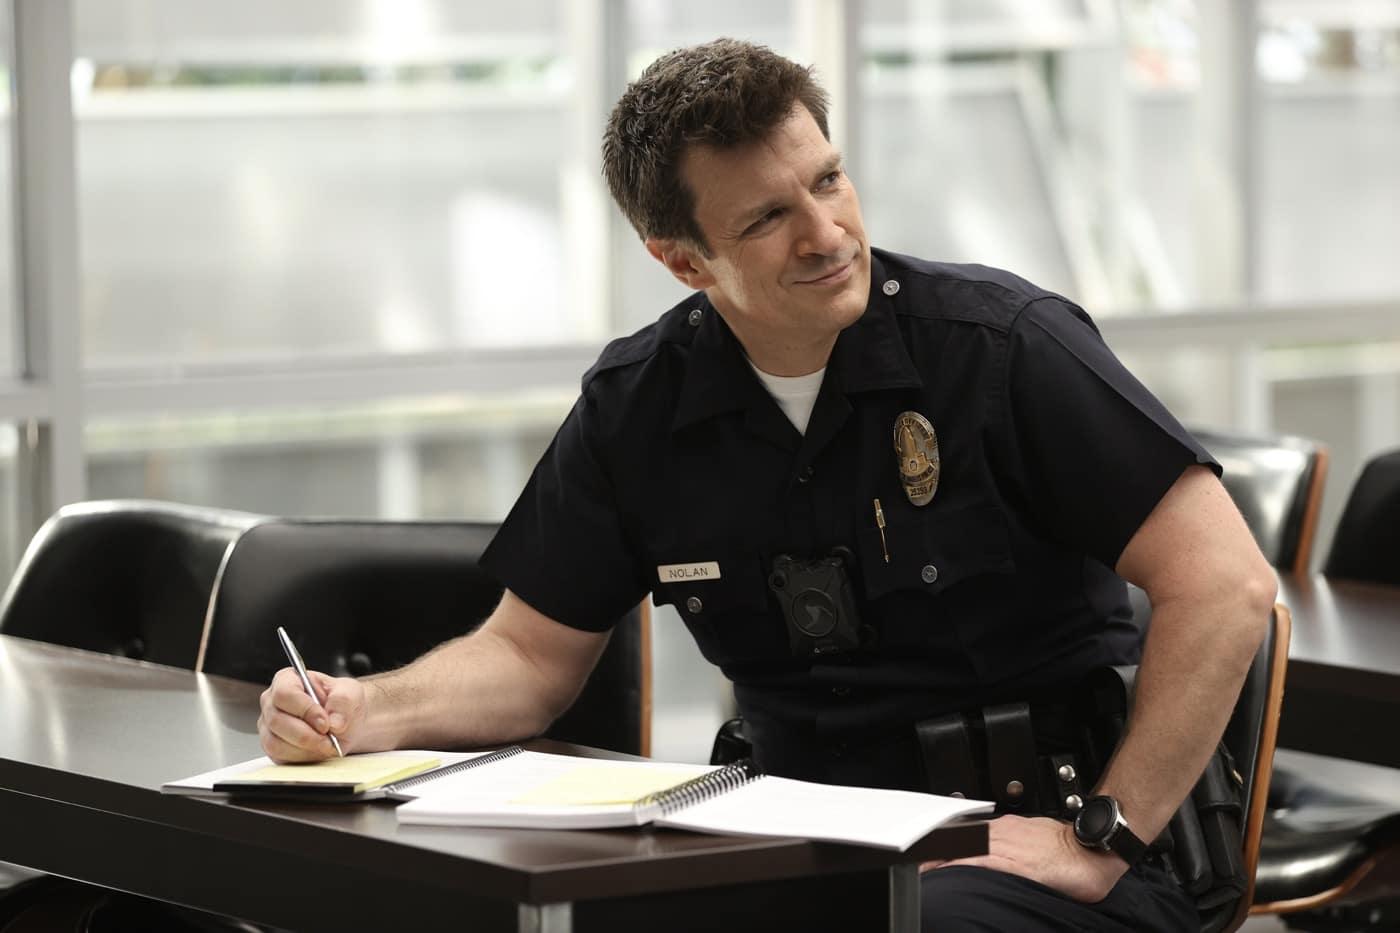 THE ROOKIE Season 3 Episode 5 Lockdown NATHAN FILLION